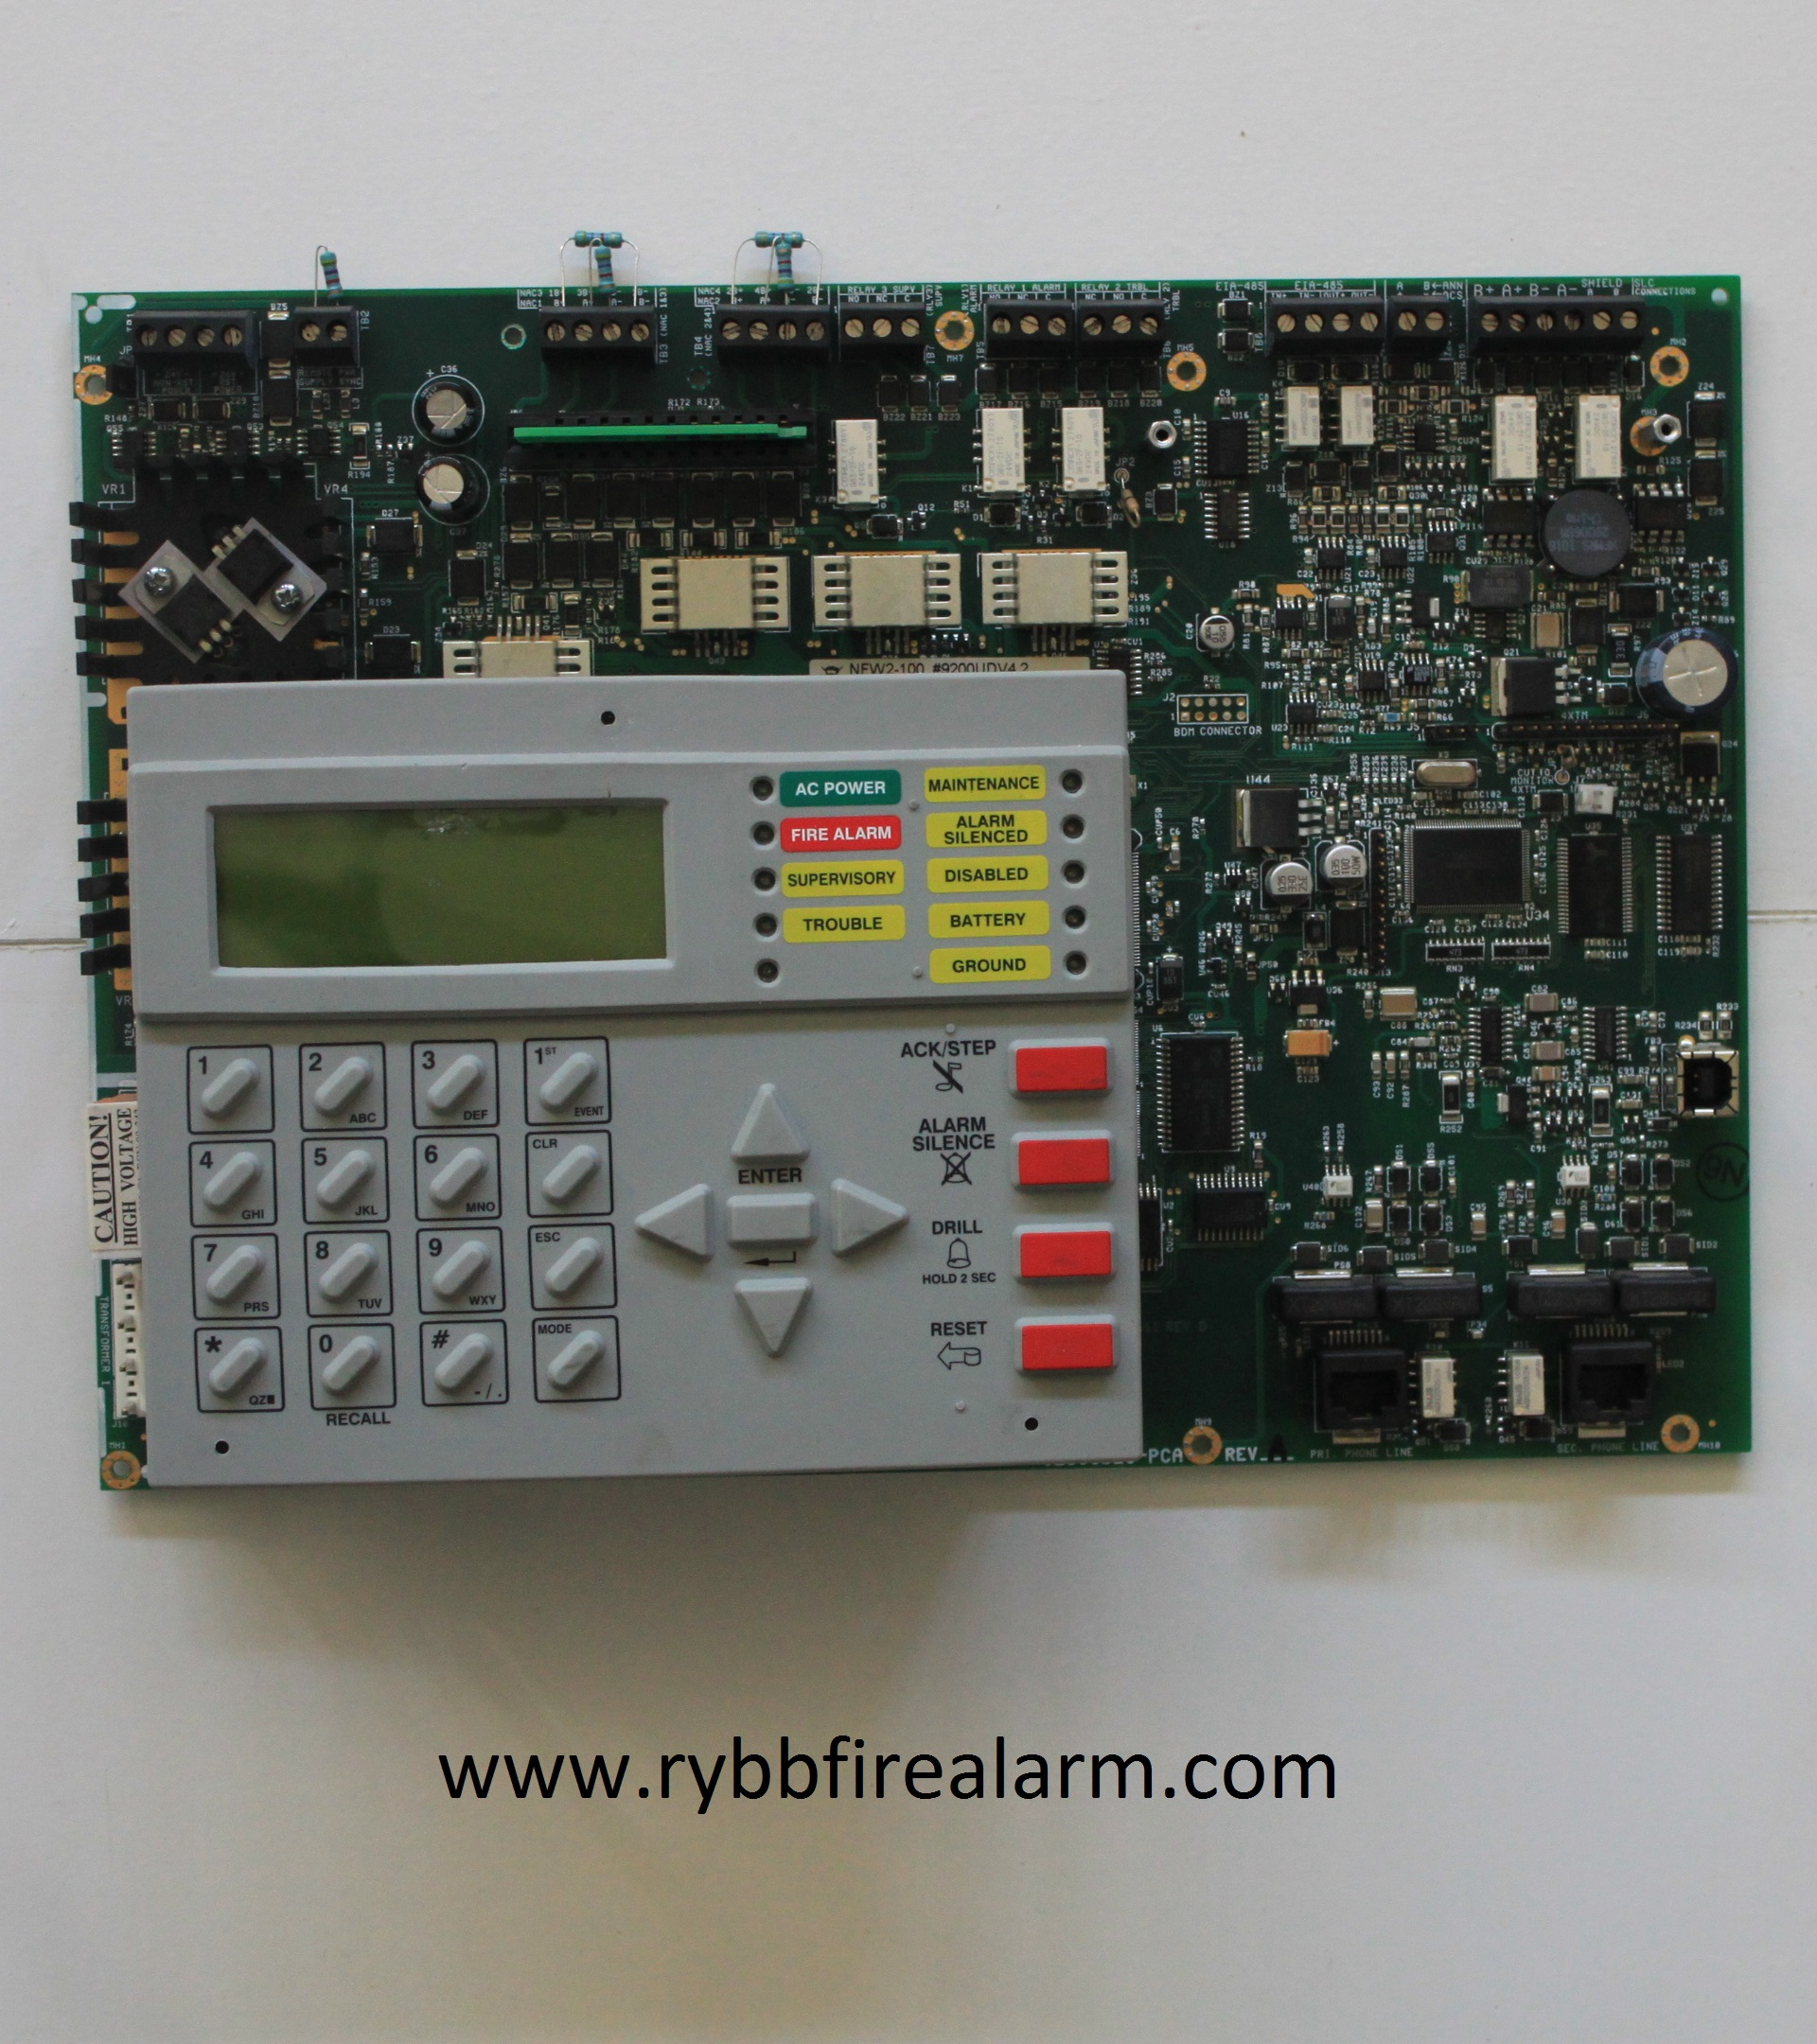 notifier duct detector wiring diagram 7 pin plug 100 simplex fire alarm for 1994 gmc safari engine